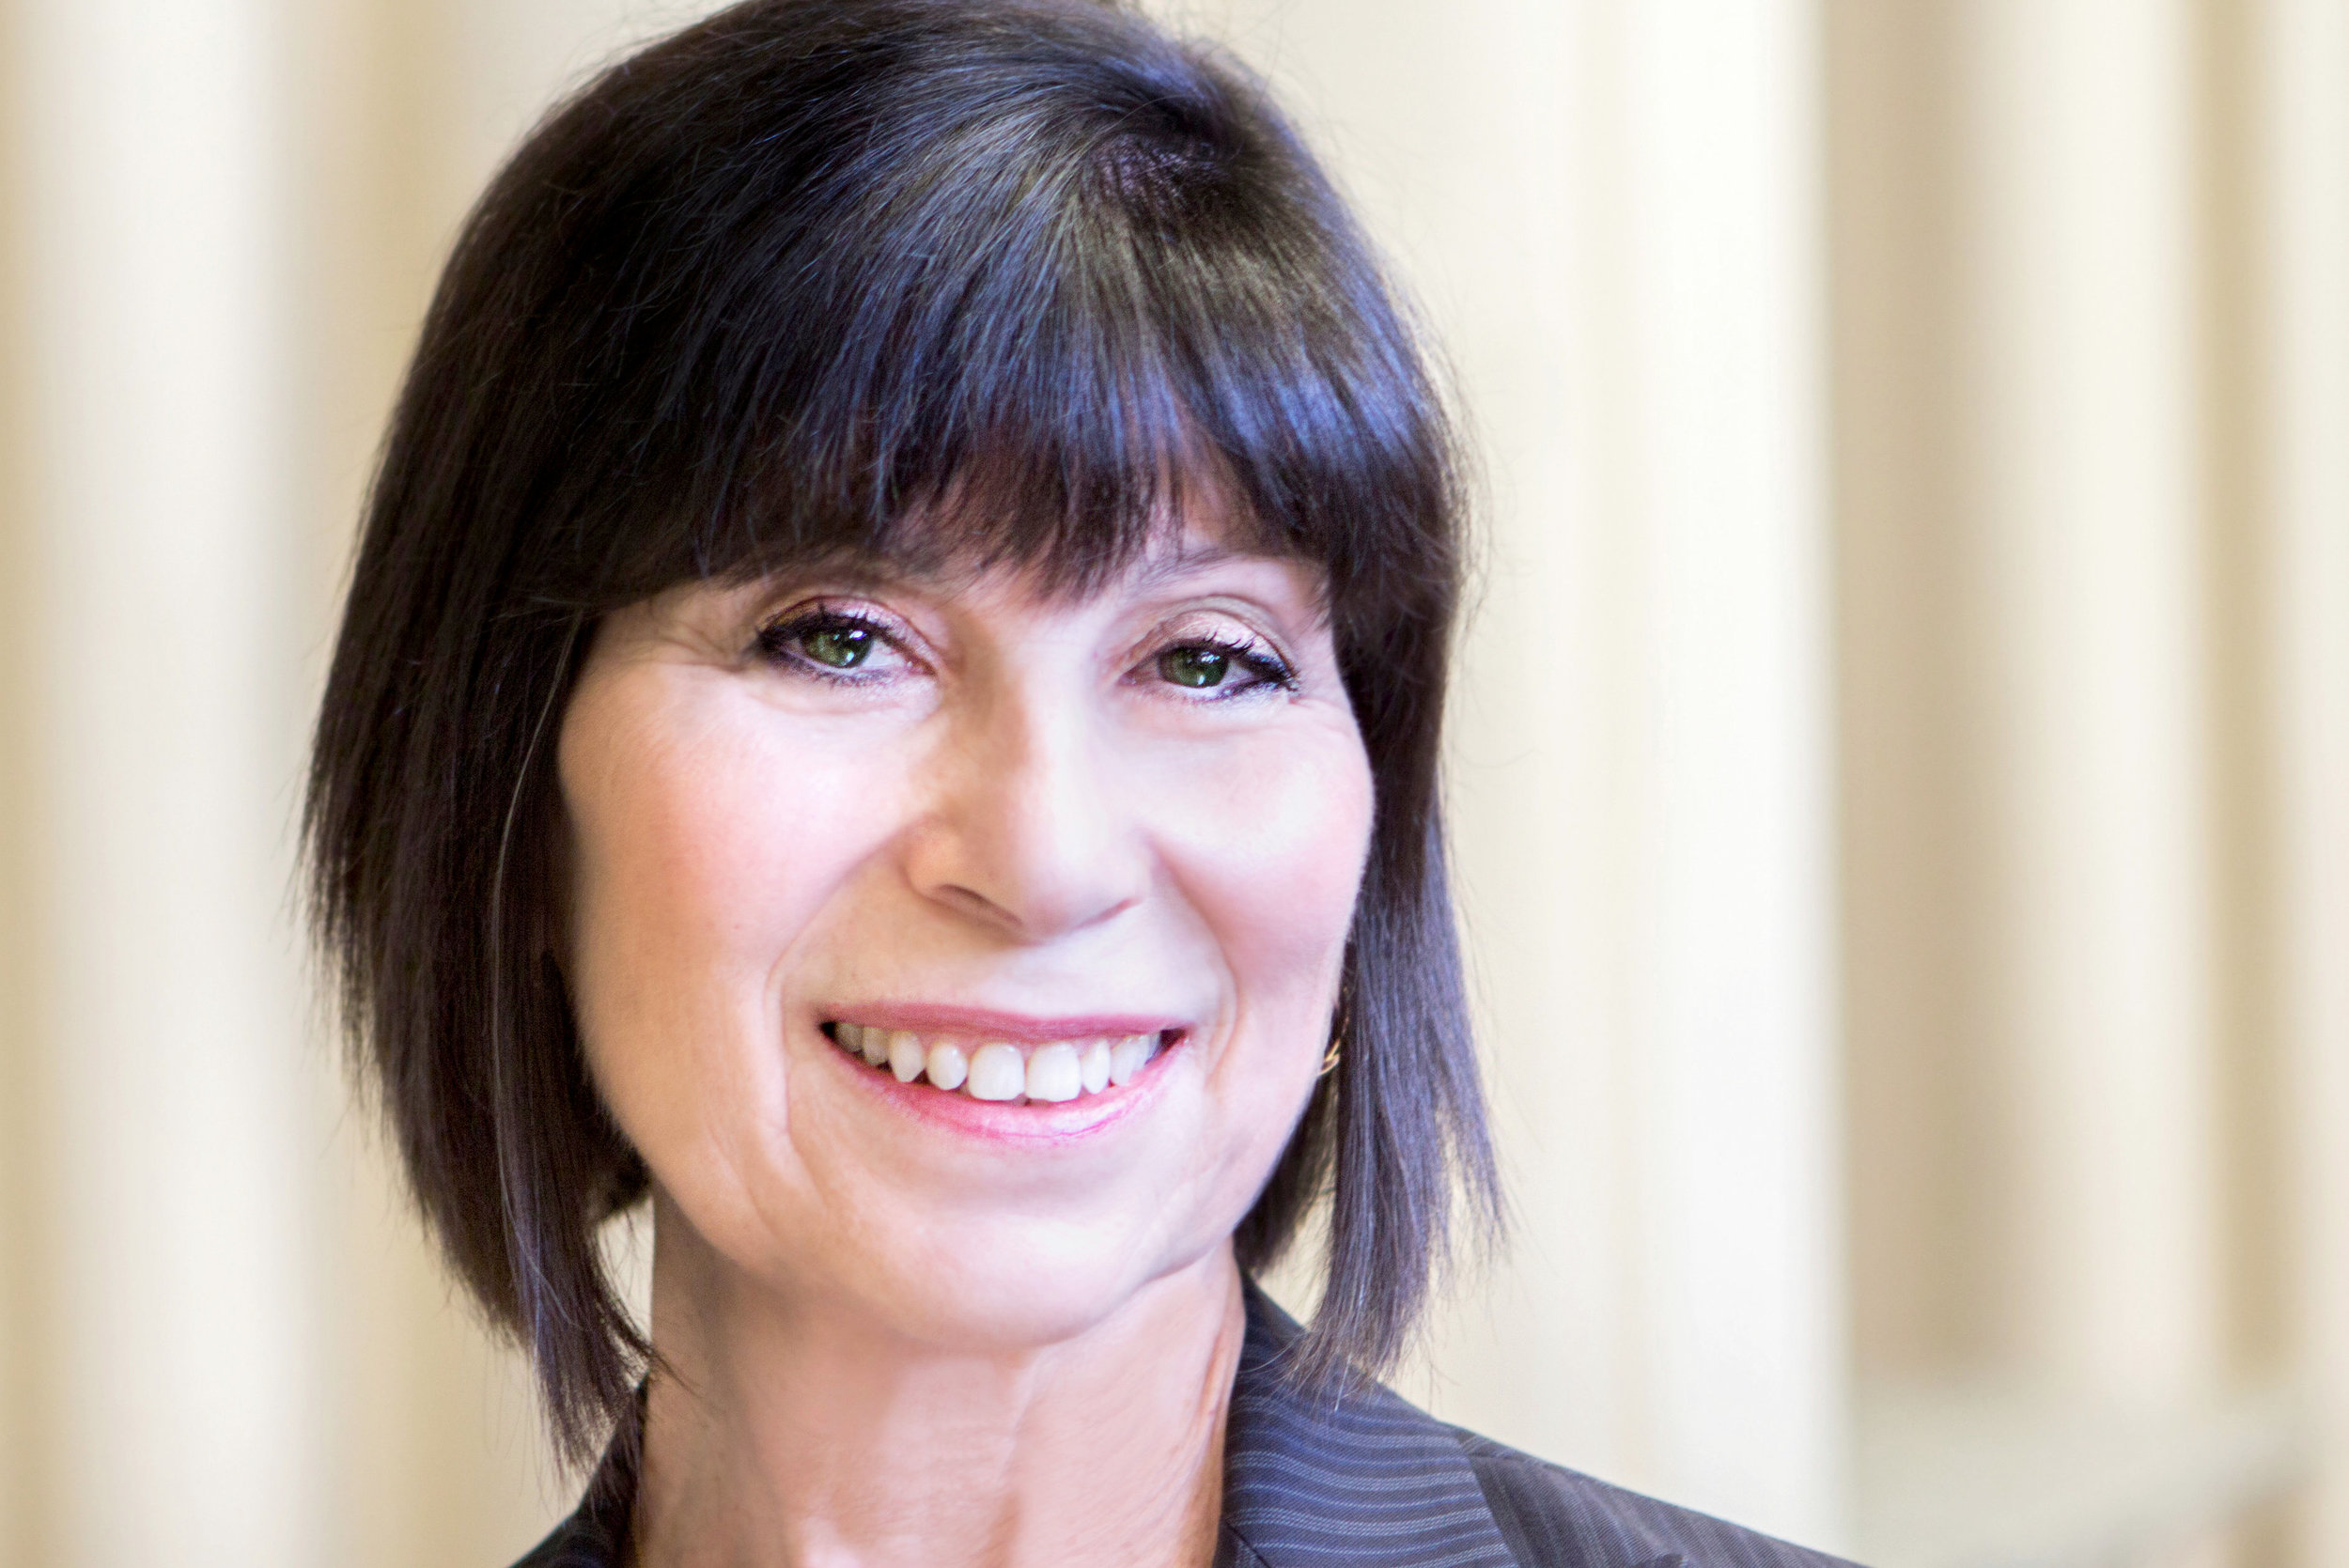 Principal Investigator / Author: Lynn Appelbaum, Professor, City College of New York